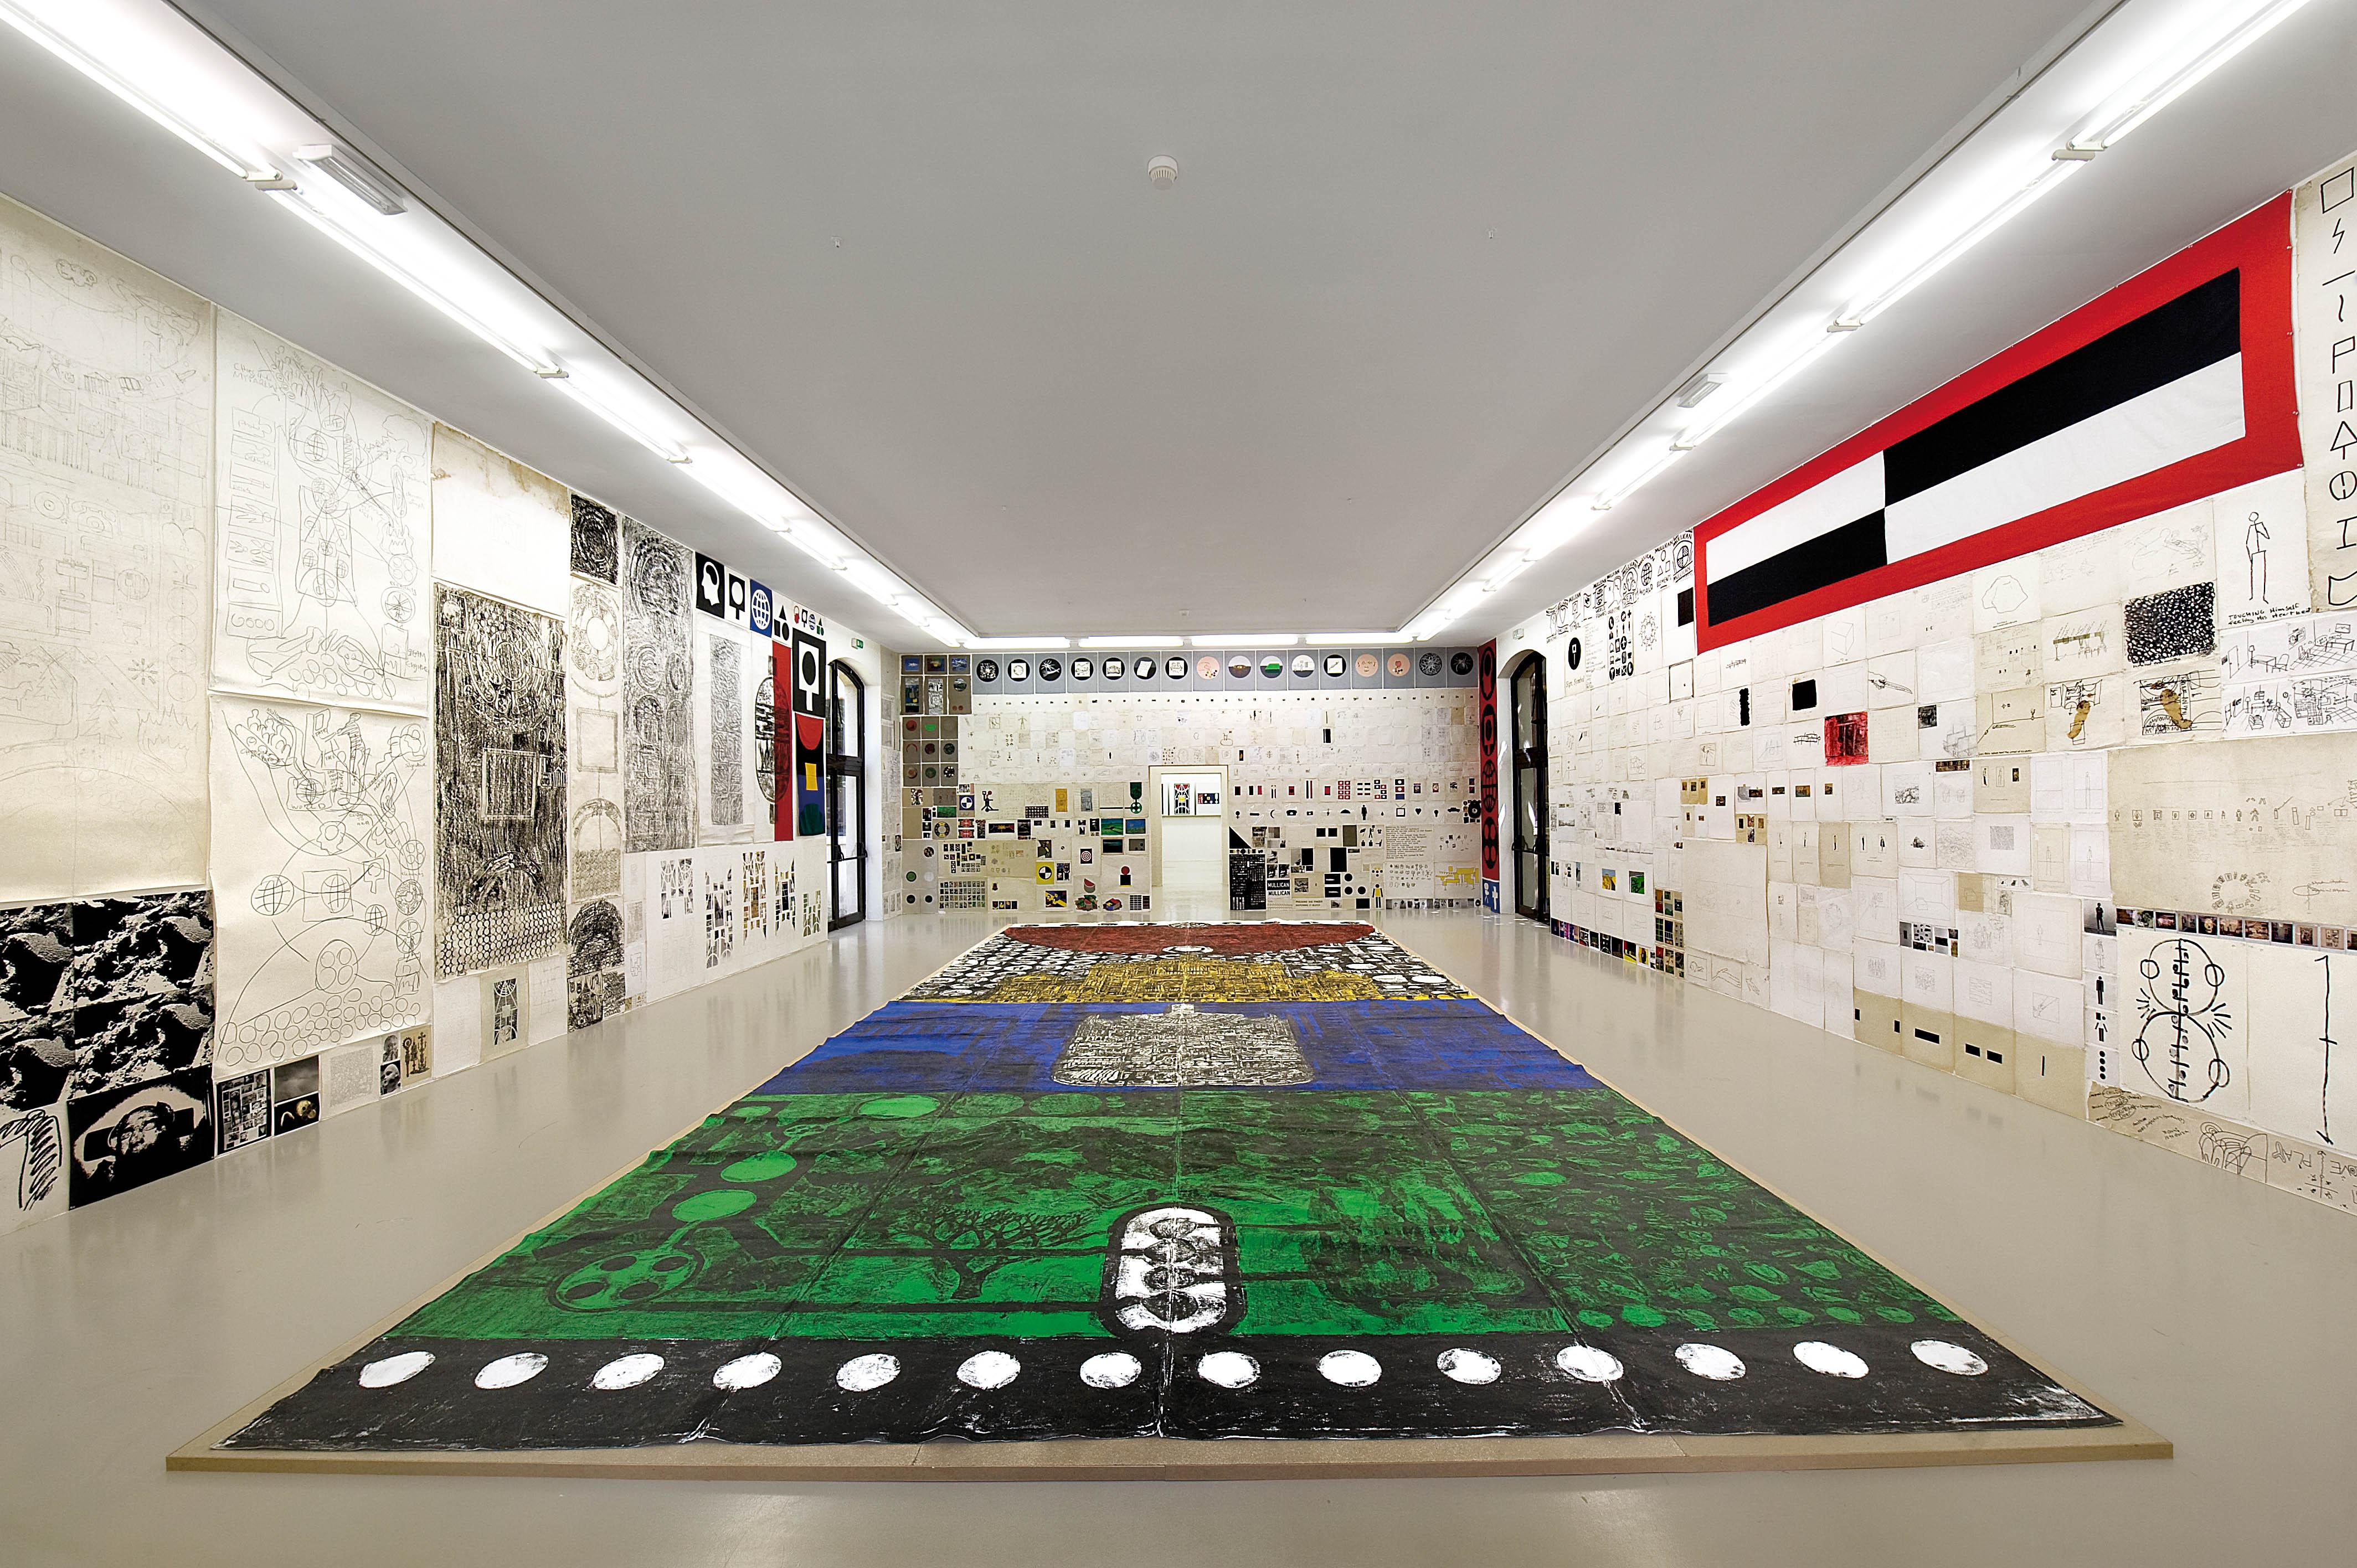 Installation view: Matt Mullican, 12 By 2, IAC Villeurbaine, France, 2010 |  | ProjecteSD